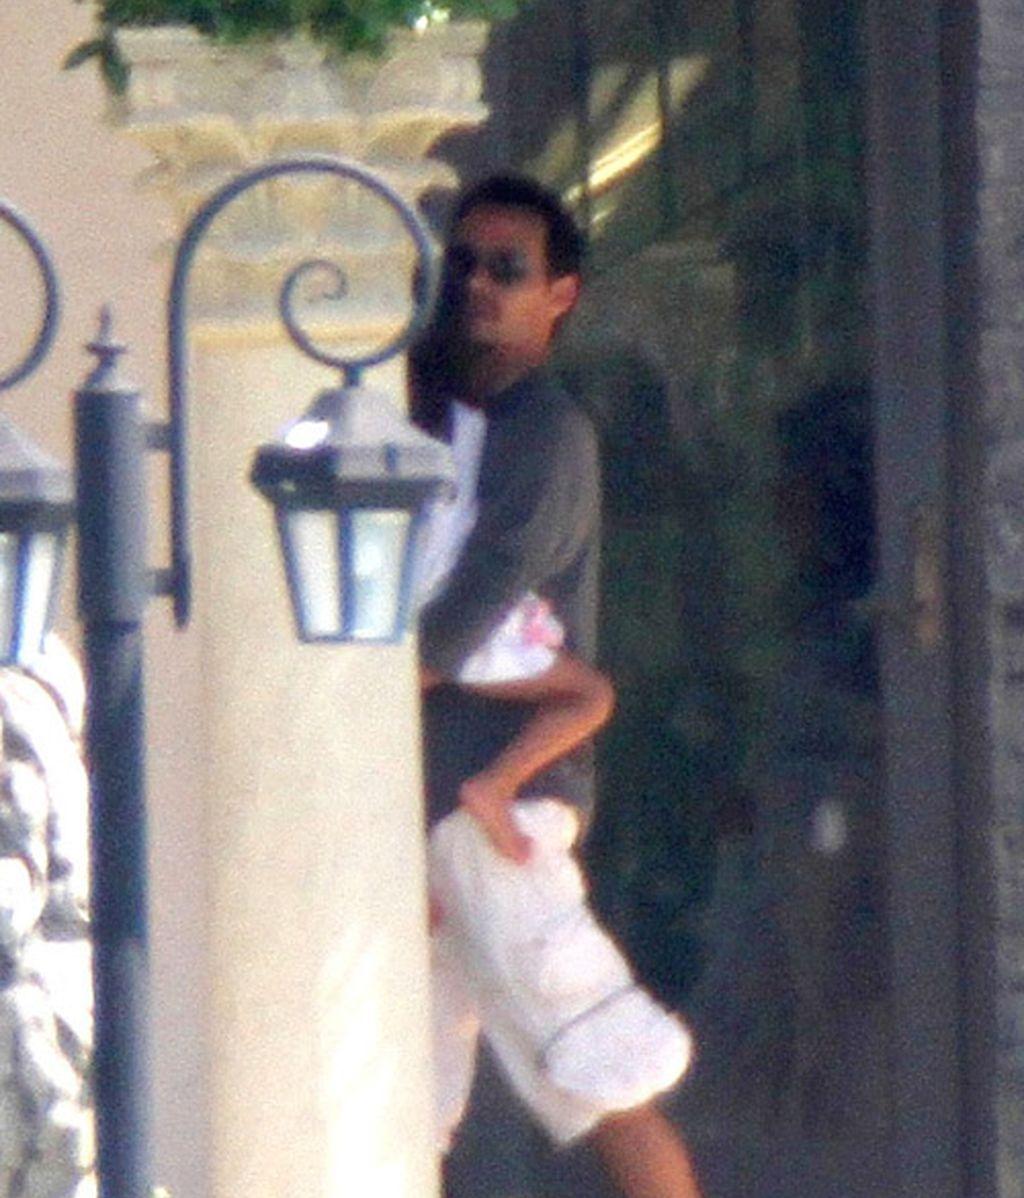 Marc Anthony celebra su 43 cumpleaños con Jennifer López y toda la familia